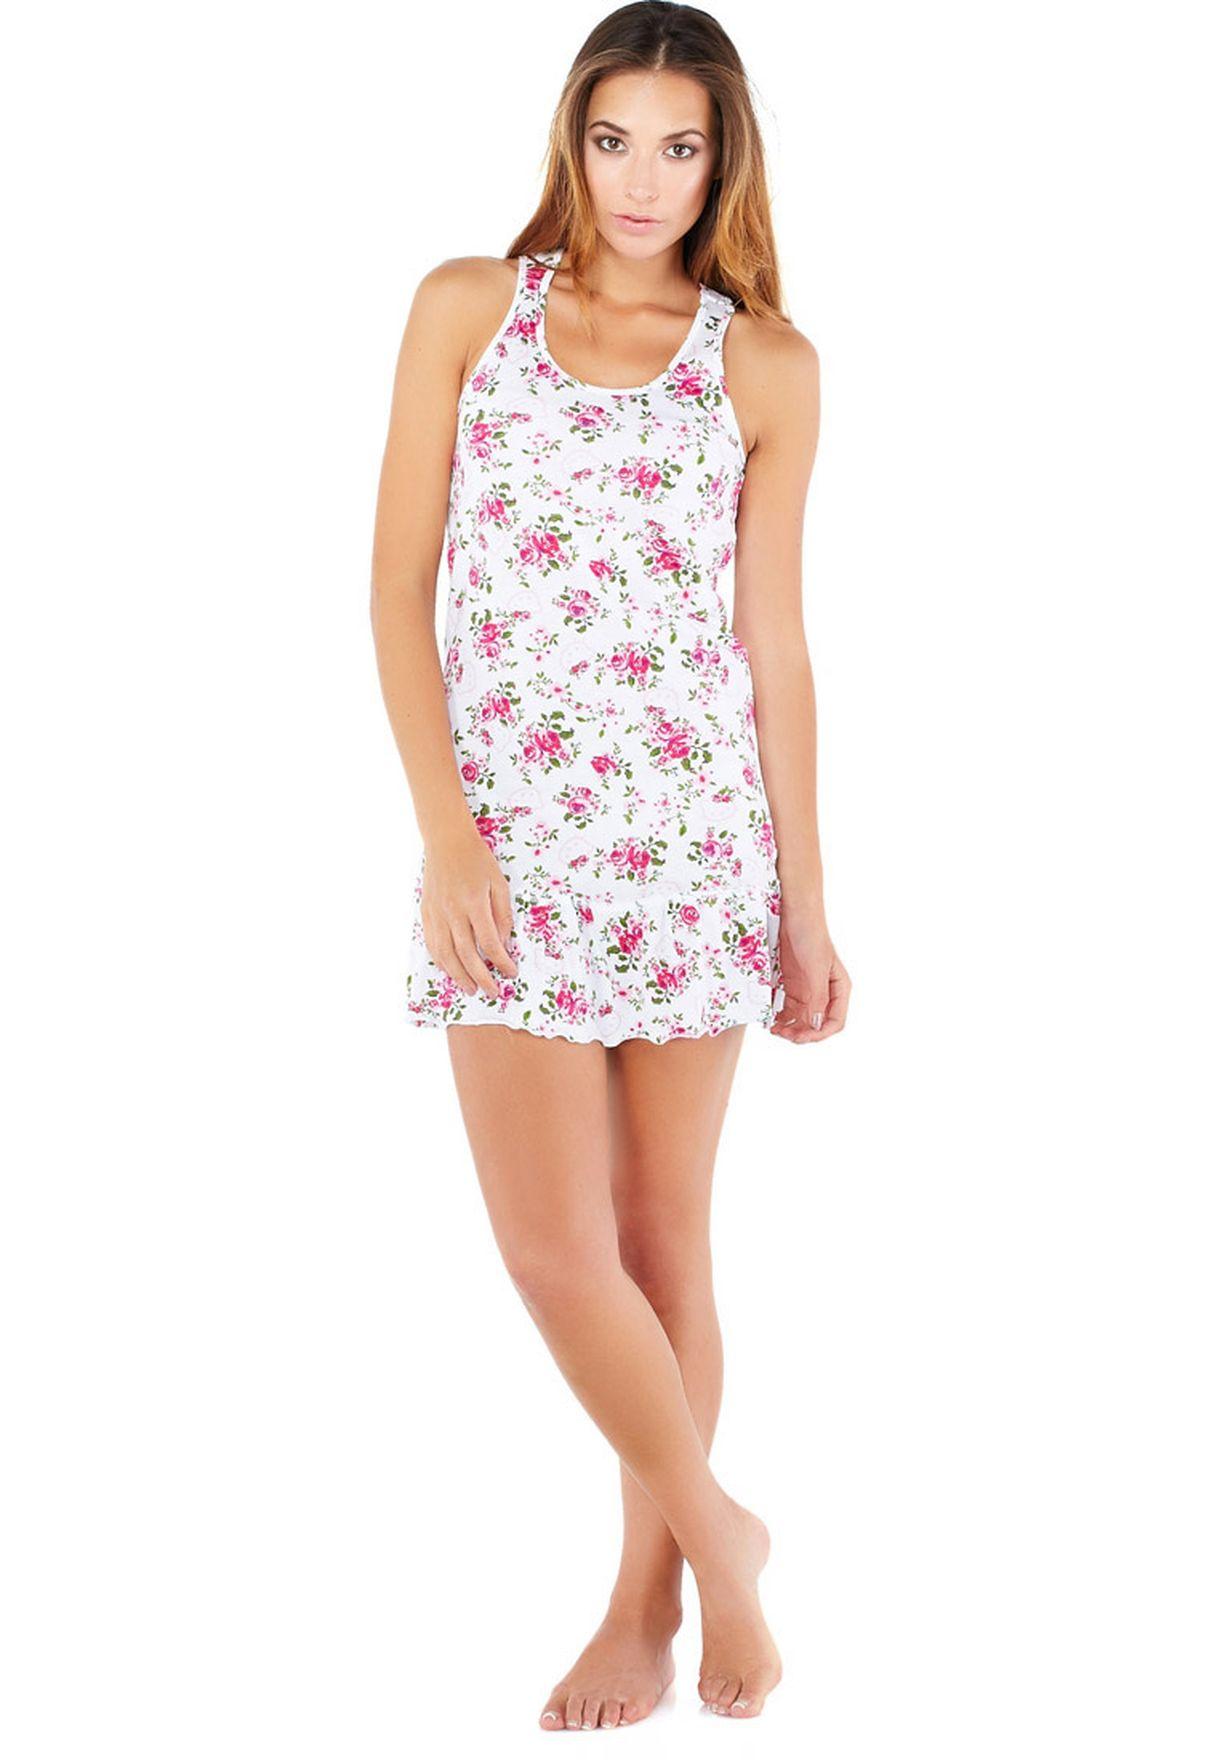 08feee300 Shop Hello Kitty prints Hello Kitty Sleep Shirt for Women in Oman ...